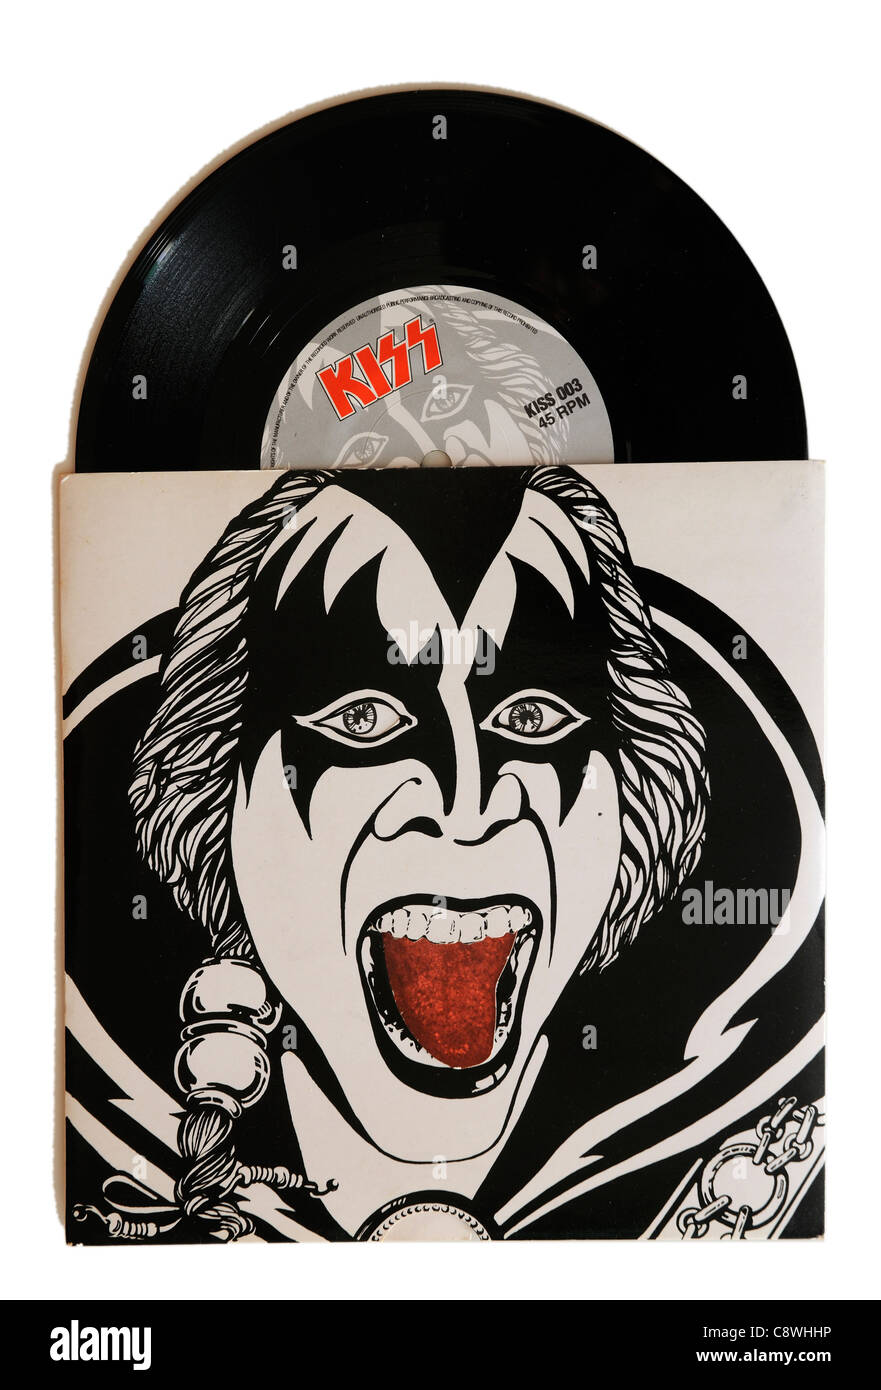 Kiss Lick it up 7' singolo Immagini Stock